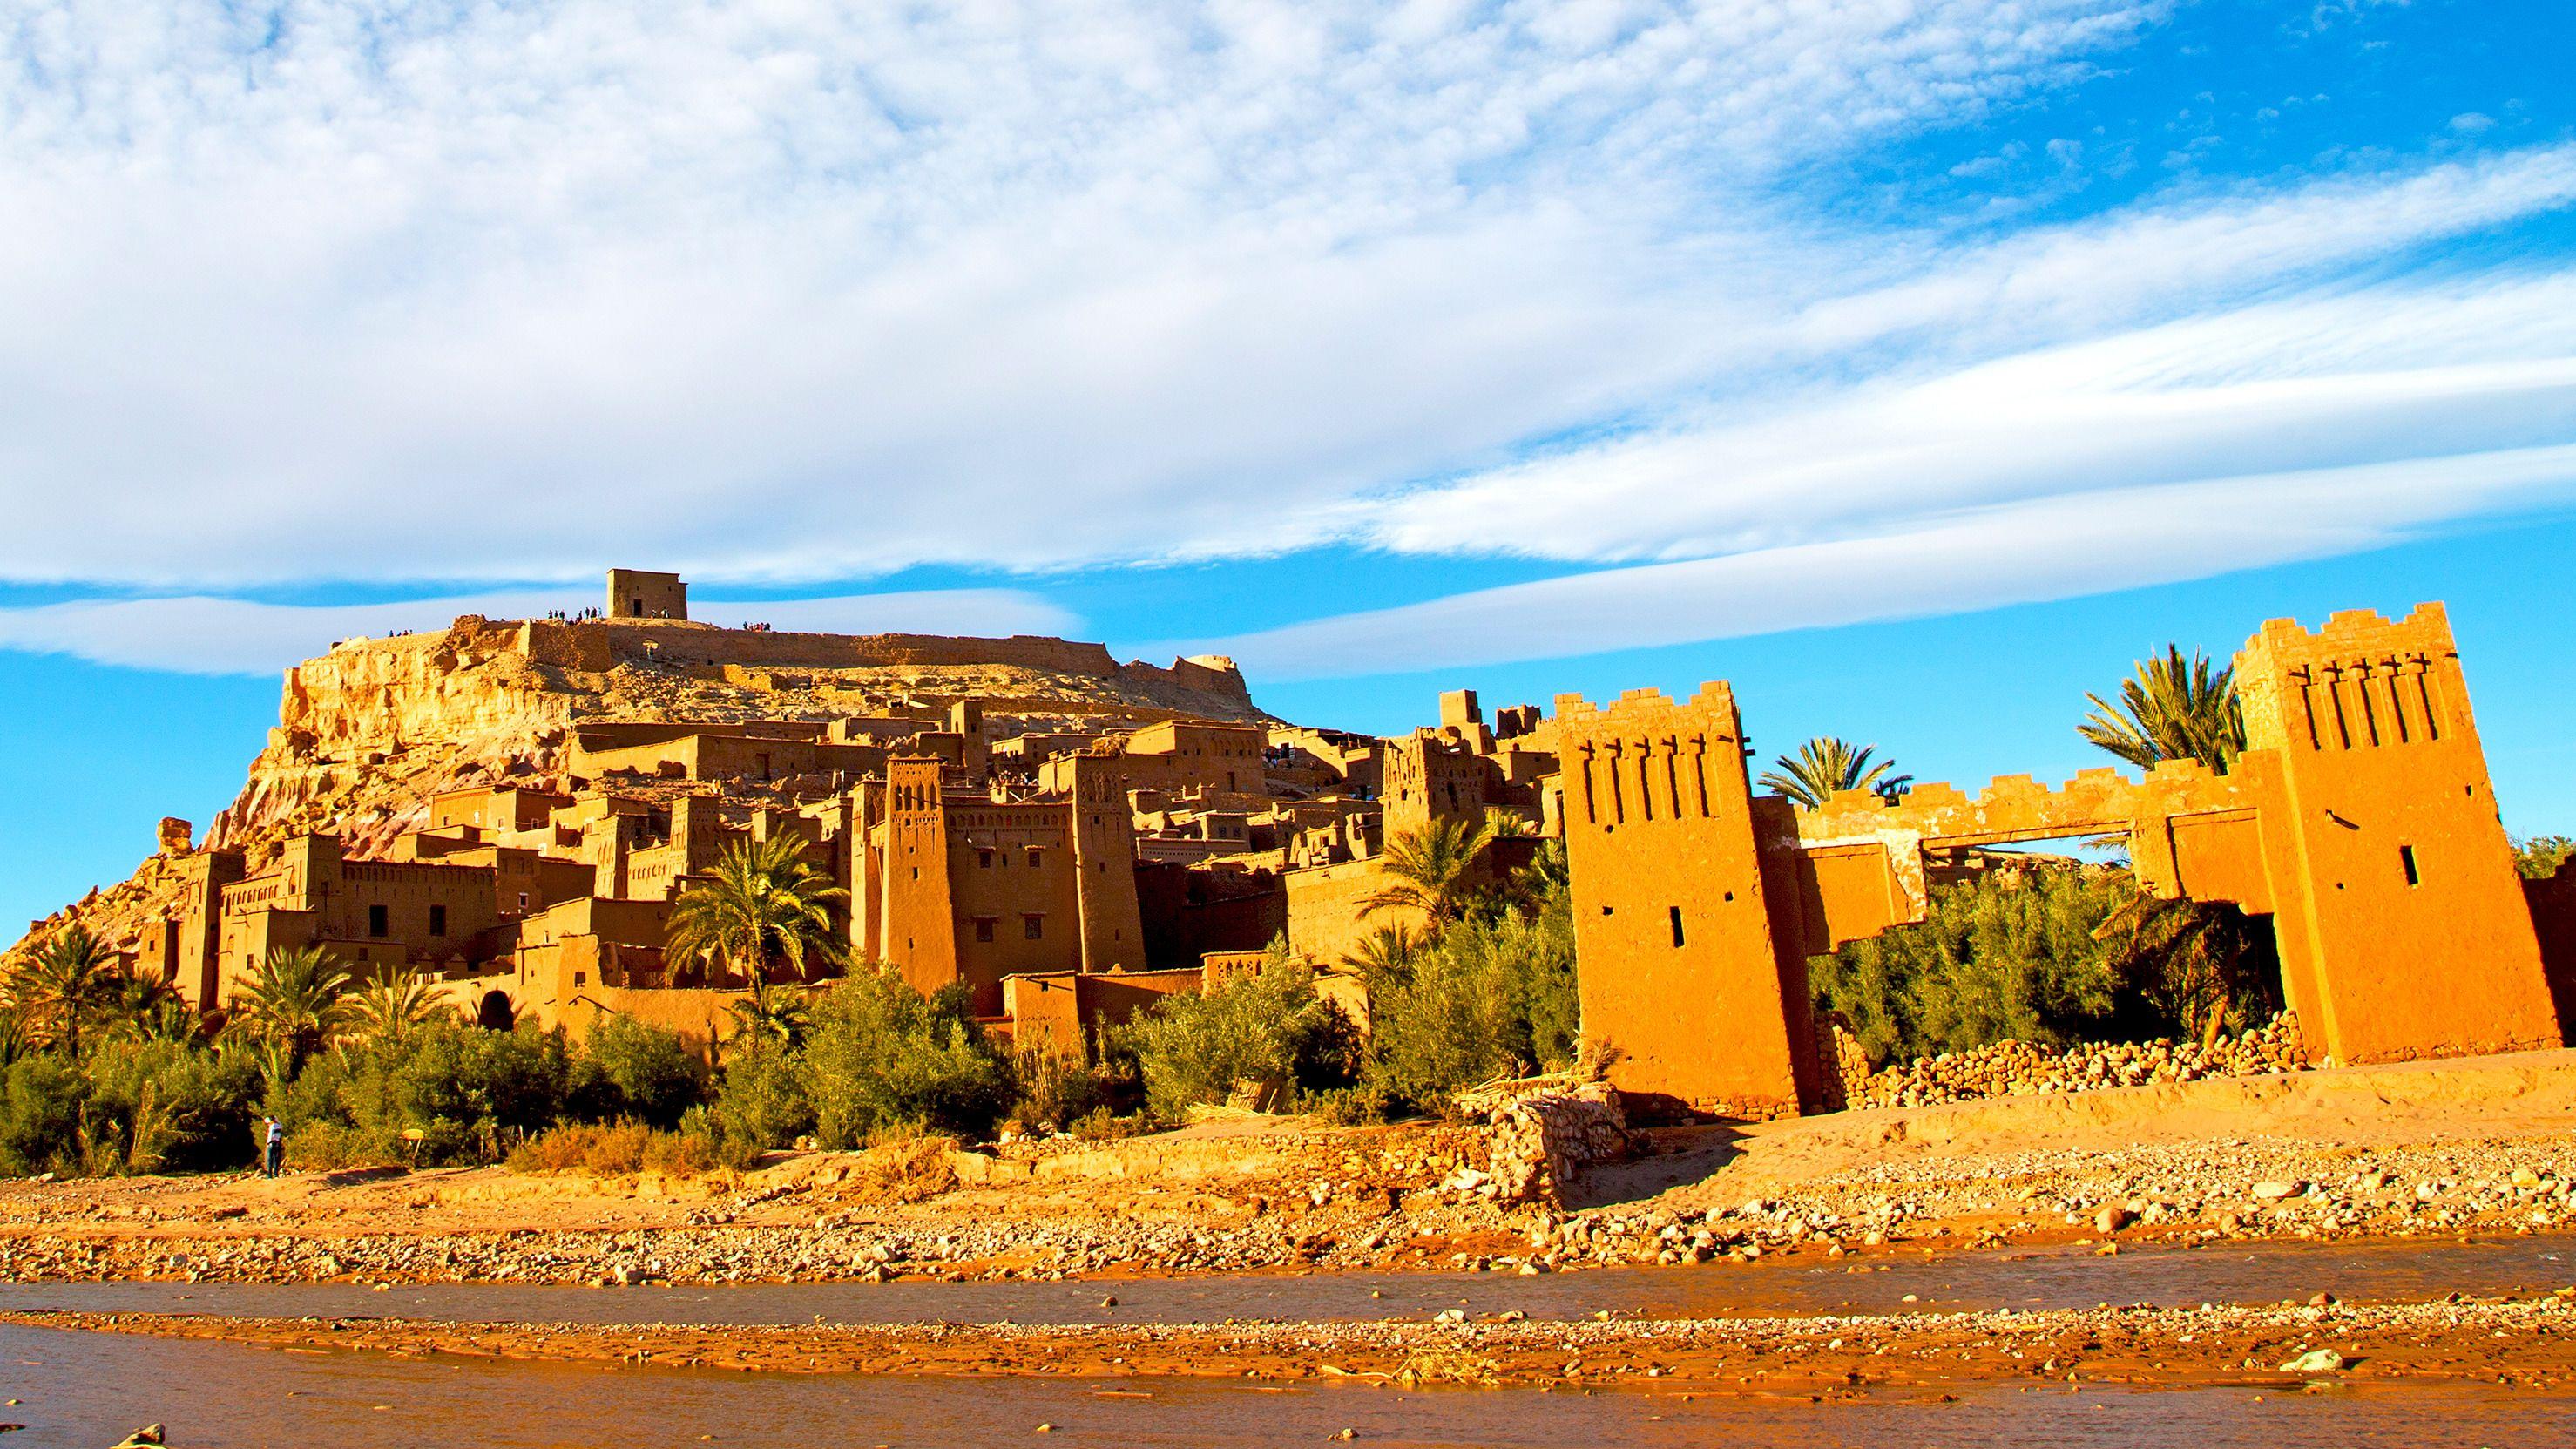 Full Day Trip To Ouarzazate & Ait ben haddou From Marrakech